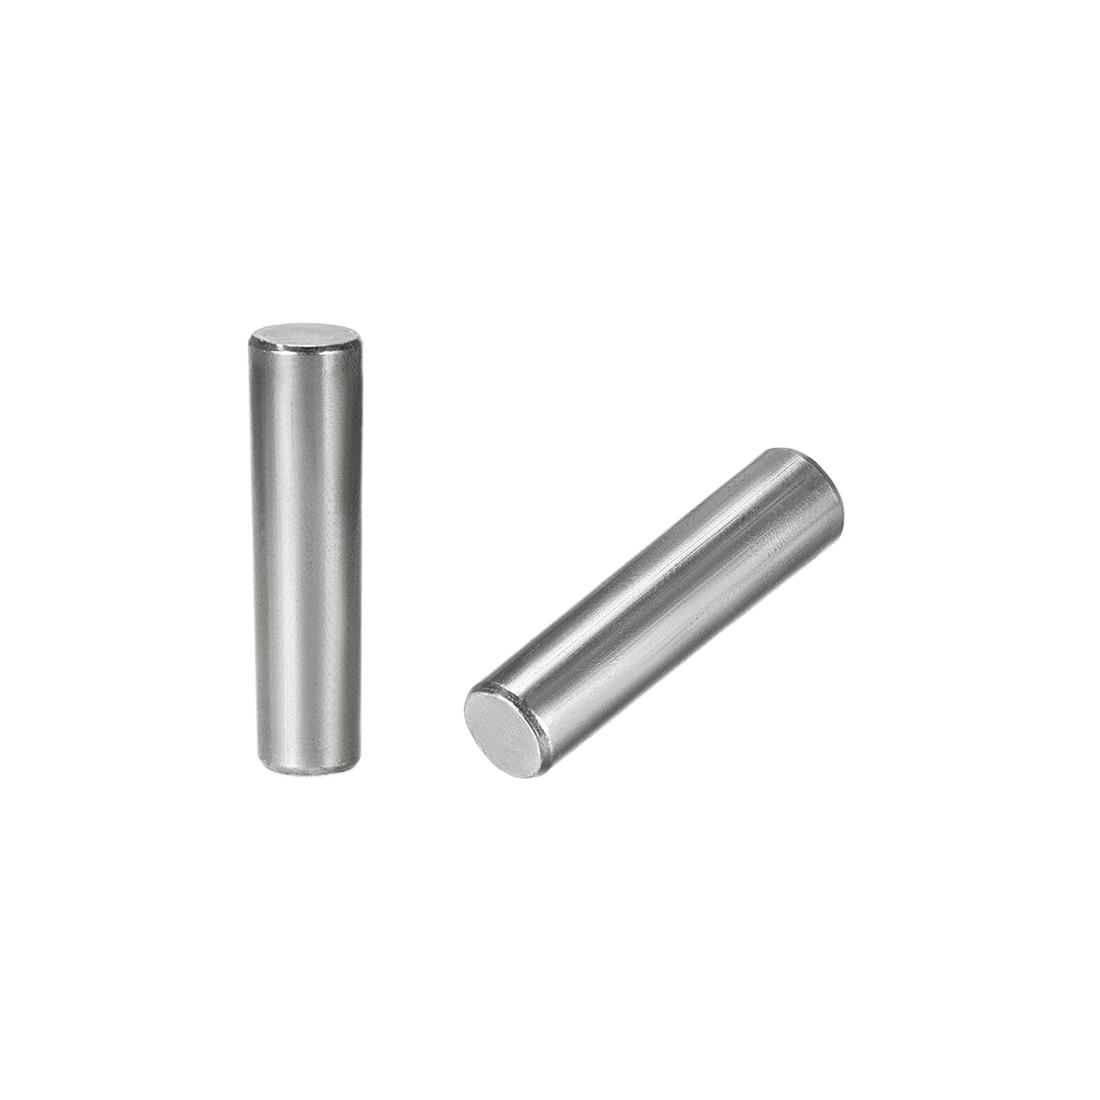 Carbon Steel GB117 50mm Length 12mm x 13mm Small End Diameter 1:50 2 Pcs